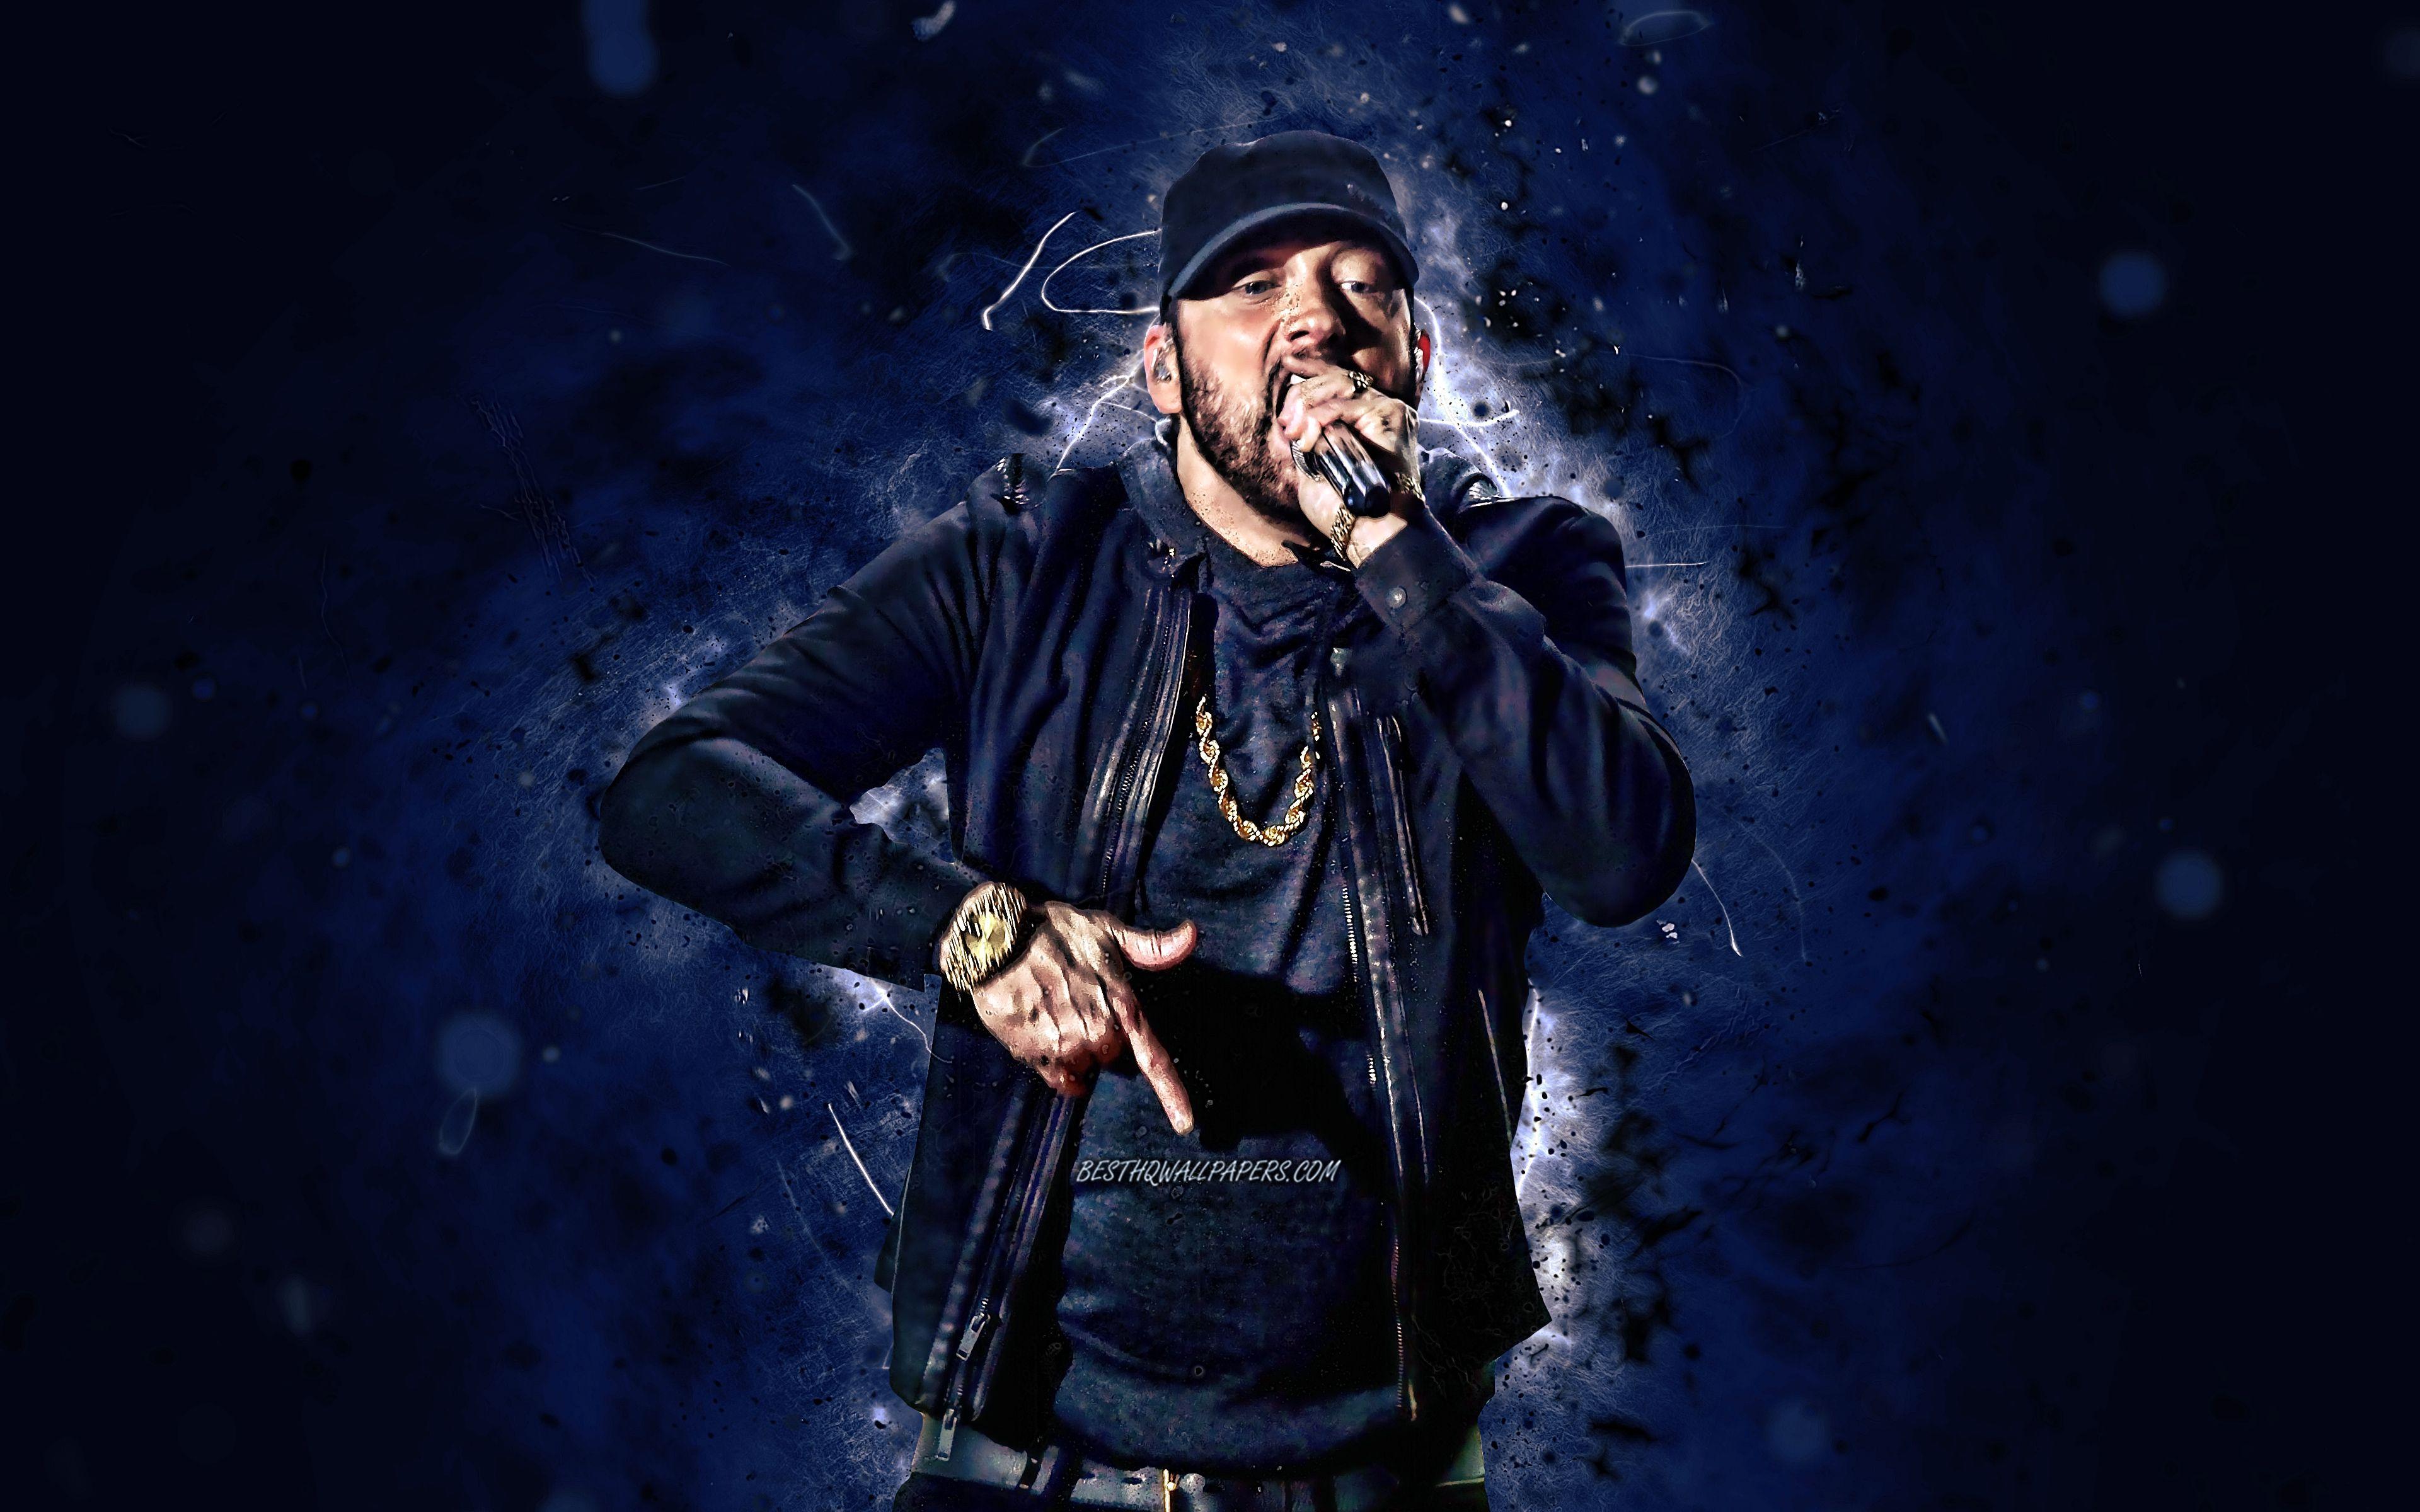 Eminem 2020 Wallpapers - Wallpaper Cave